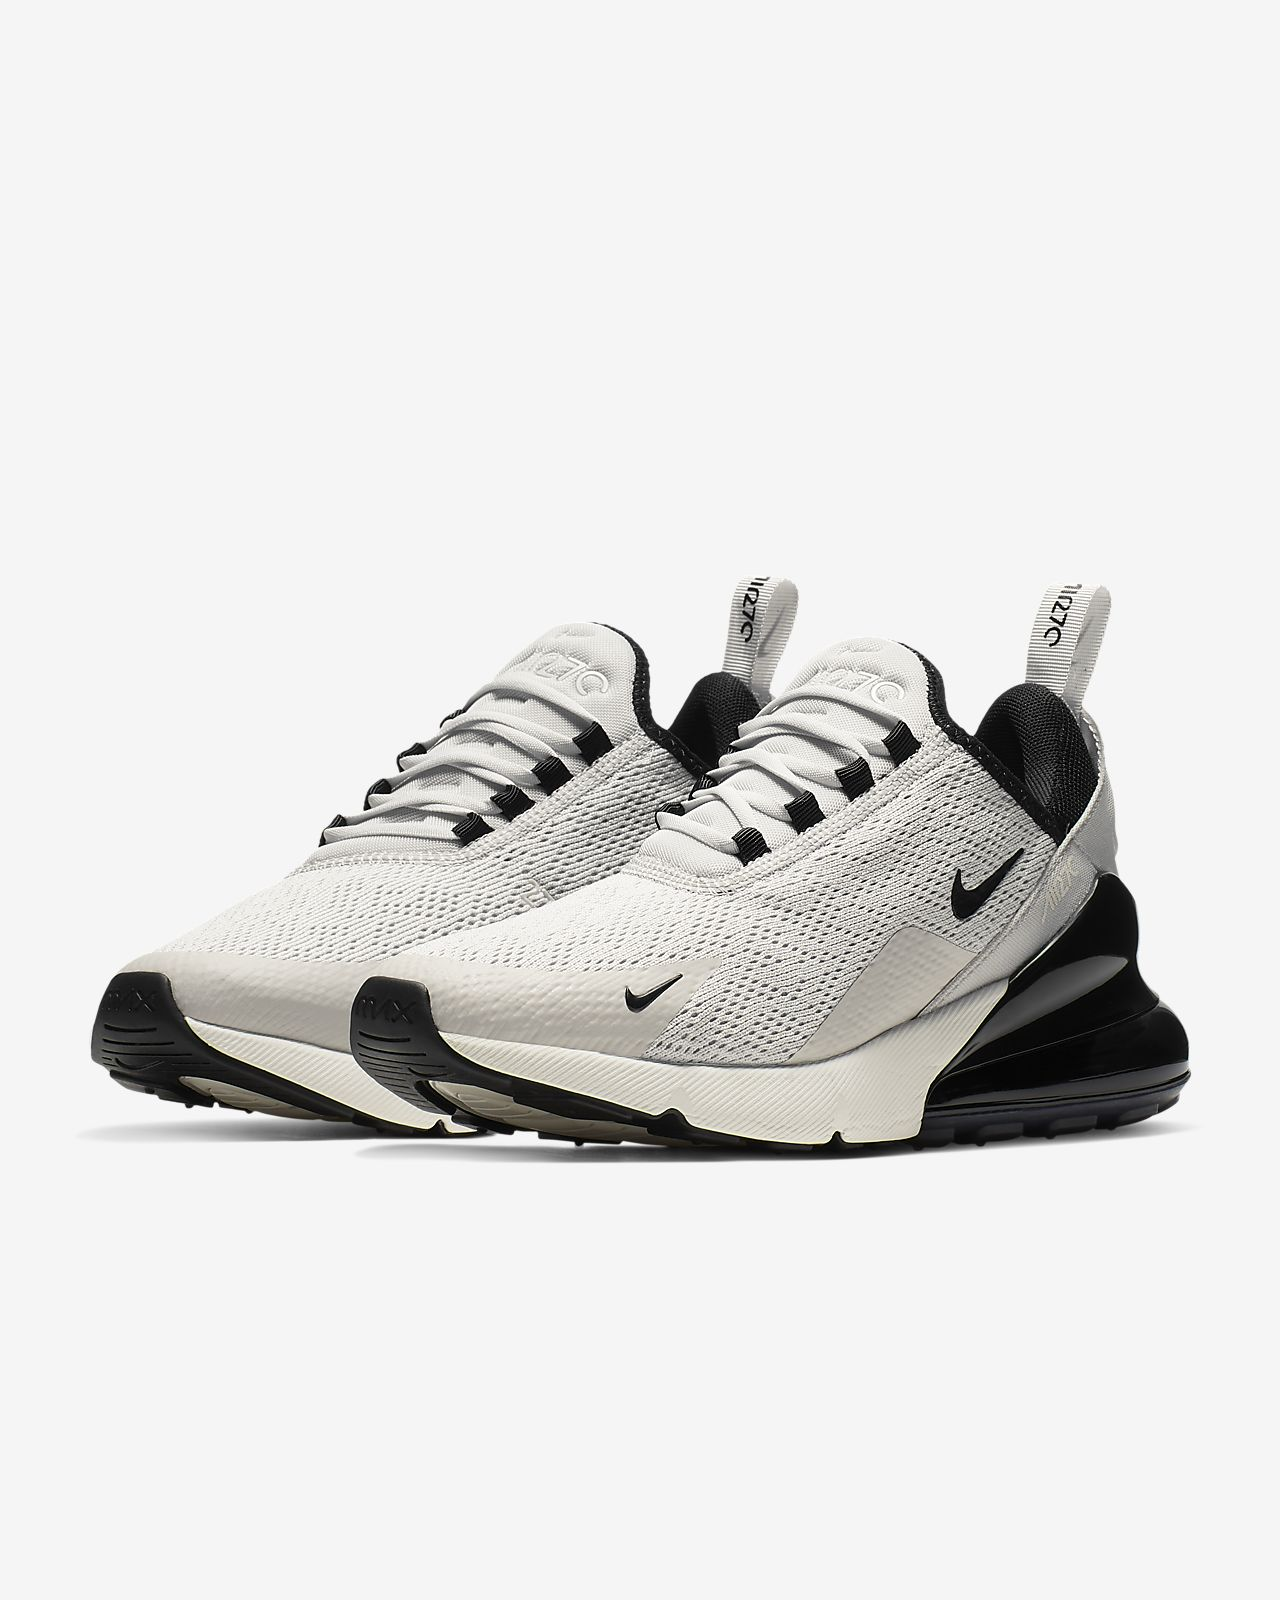 f6fc4099 Nike Air Max 270-sko til kvinder. Nike.com DK